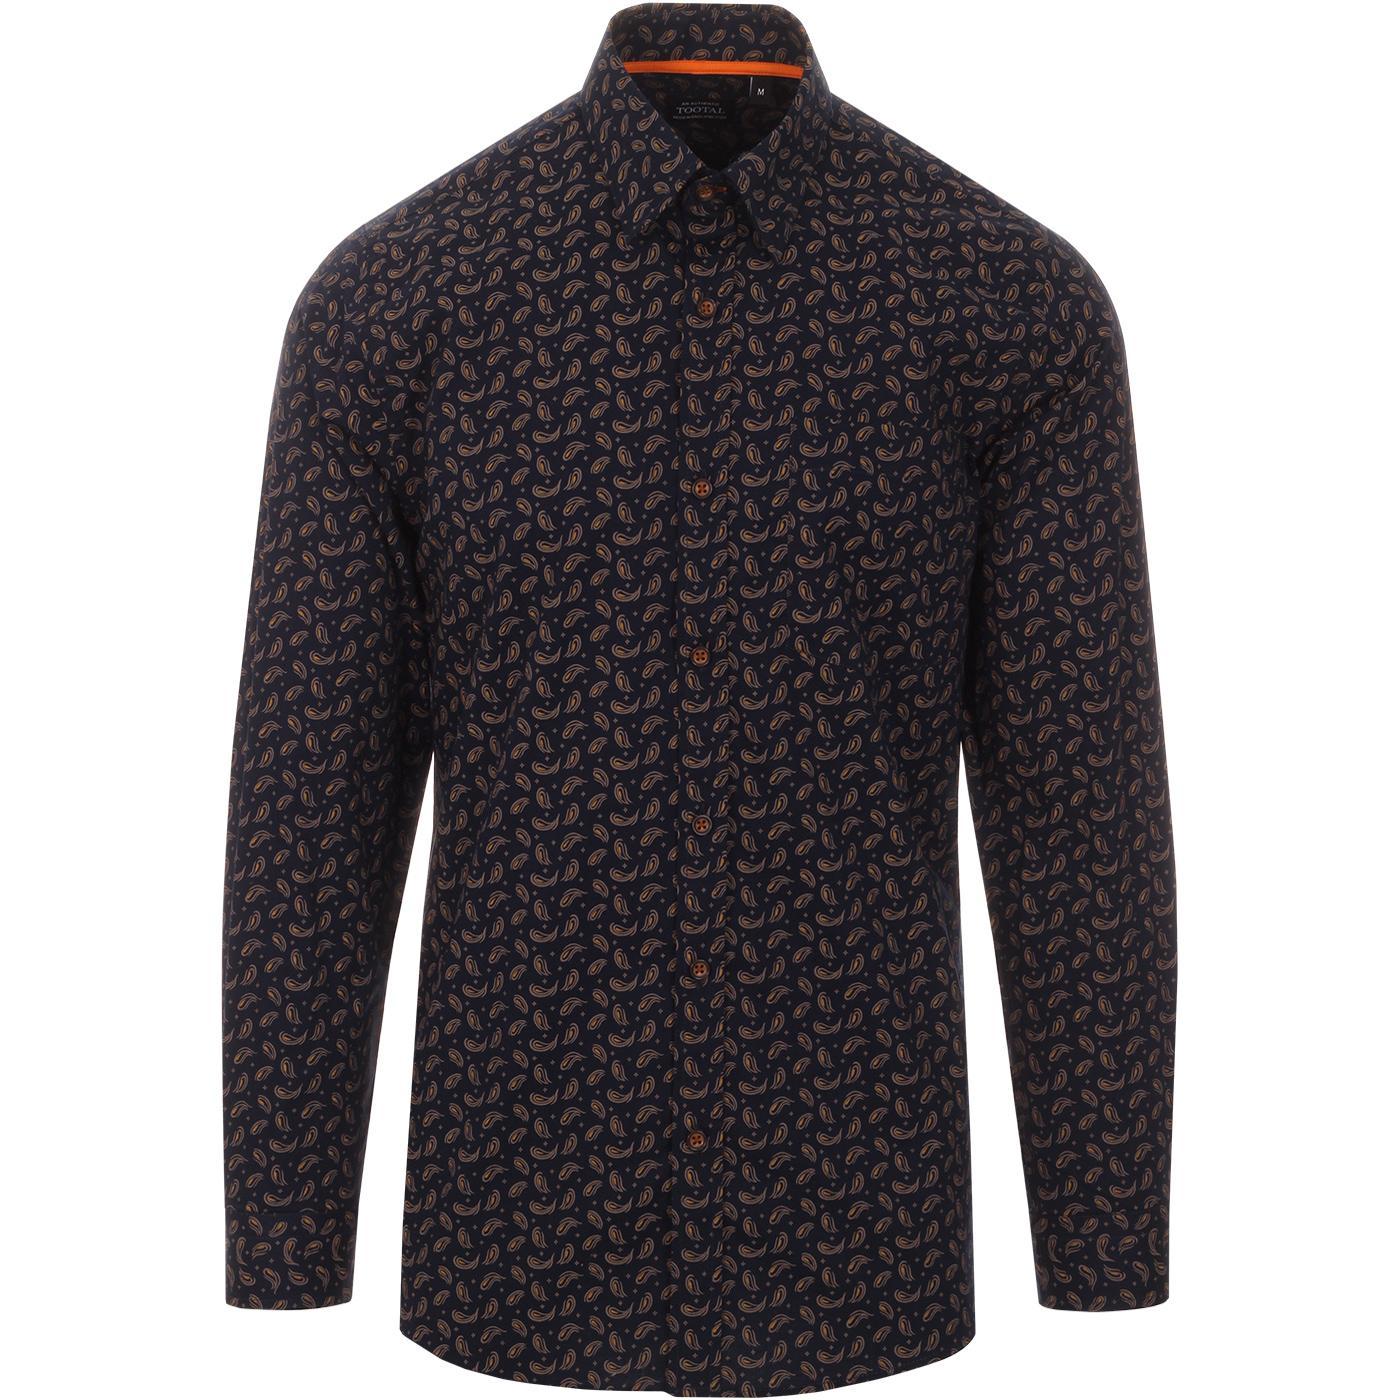 TOOTAL 60s Mod Abstract Paisley Print Shirt NAVY